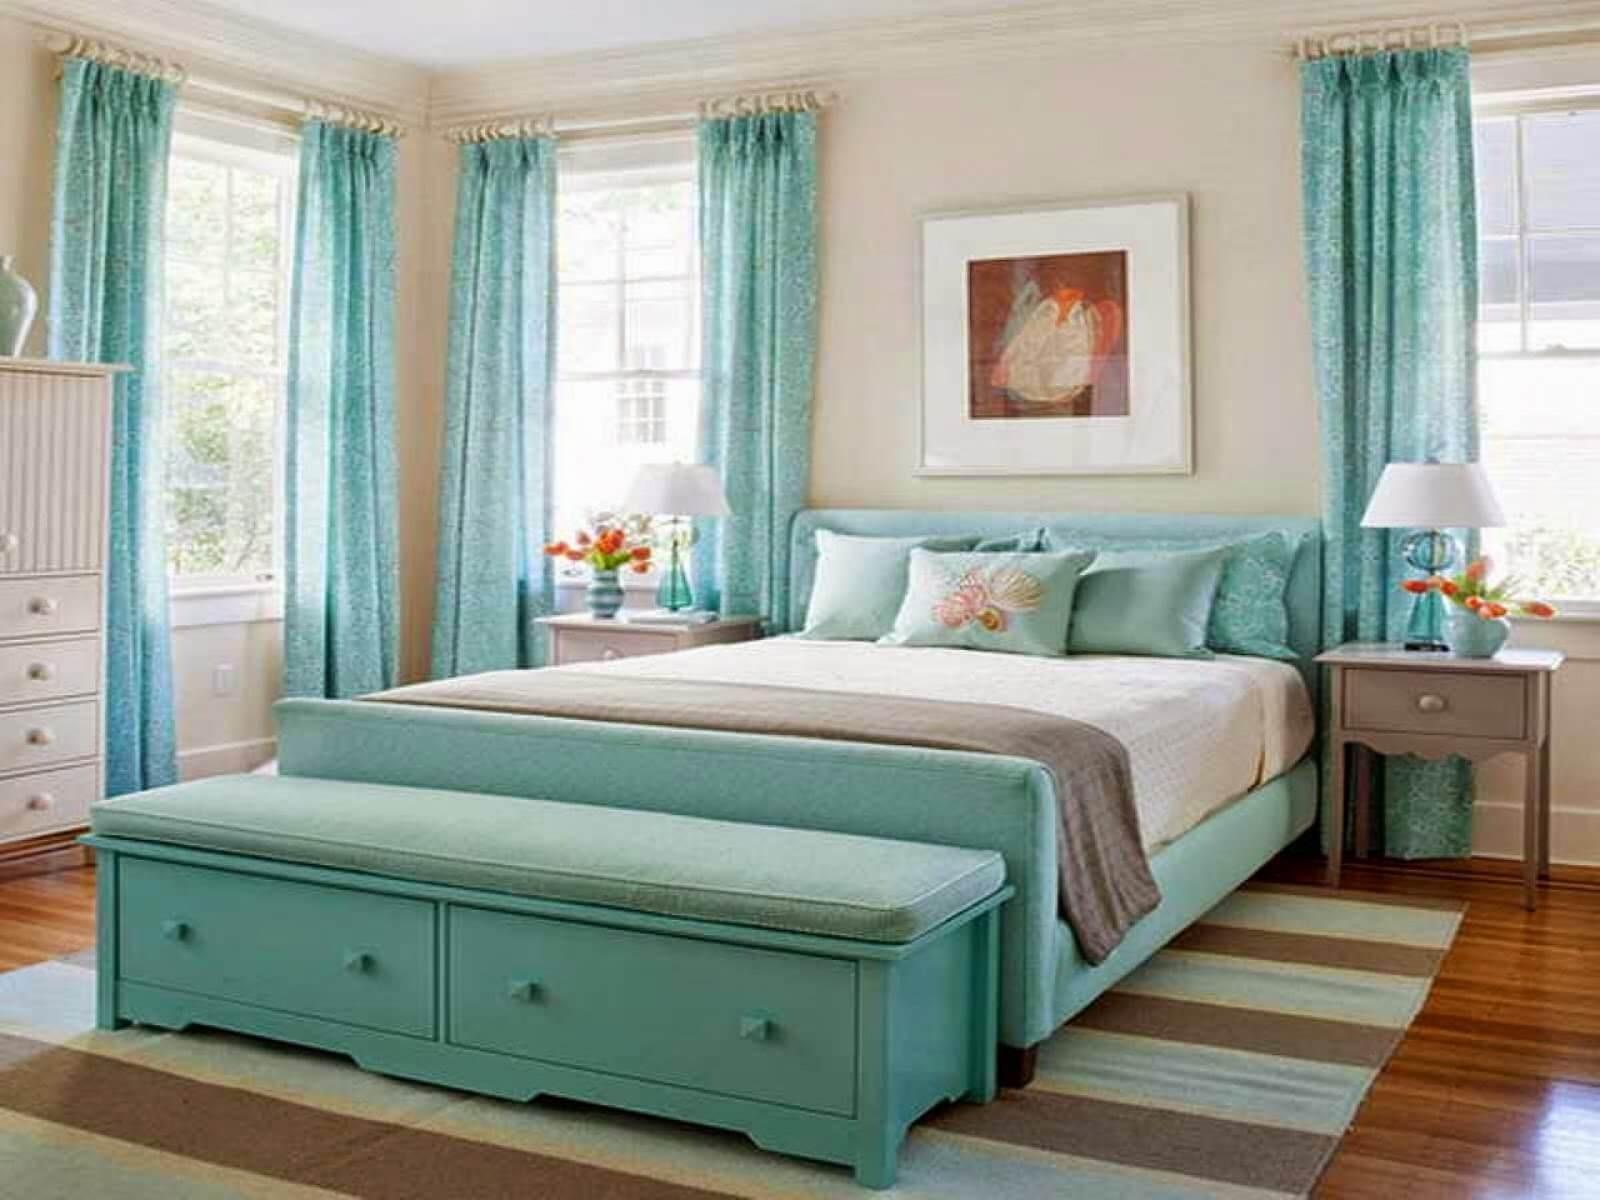 turkuaz-renk-yatak-odasi